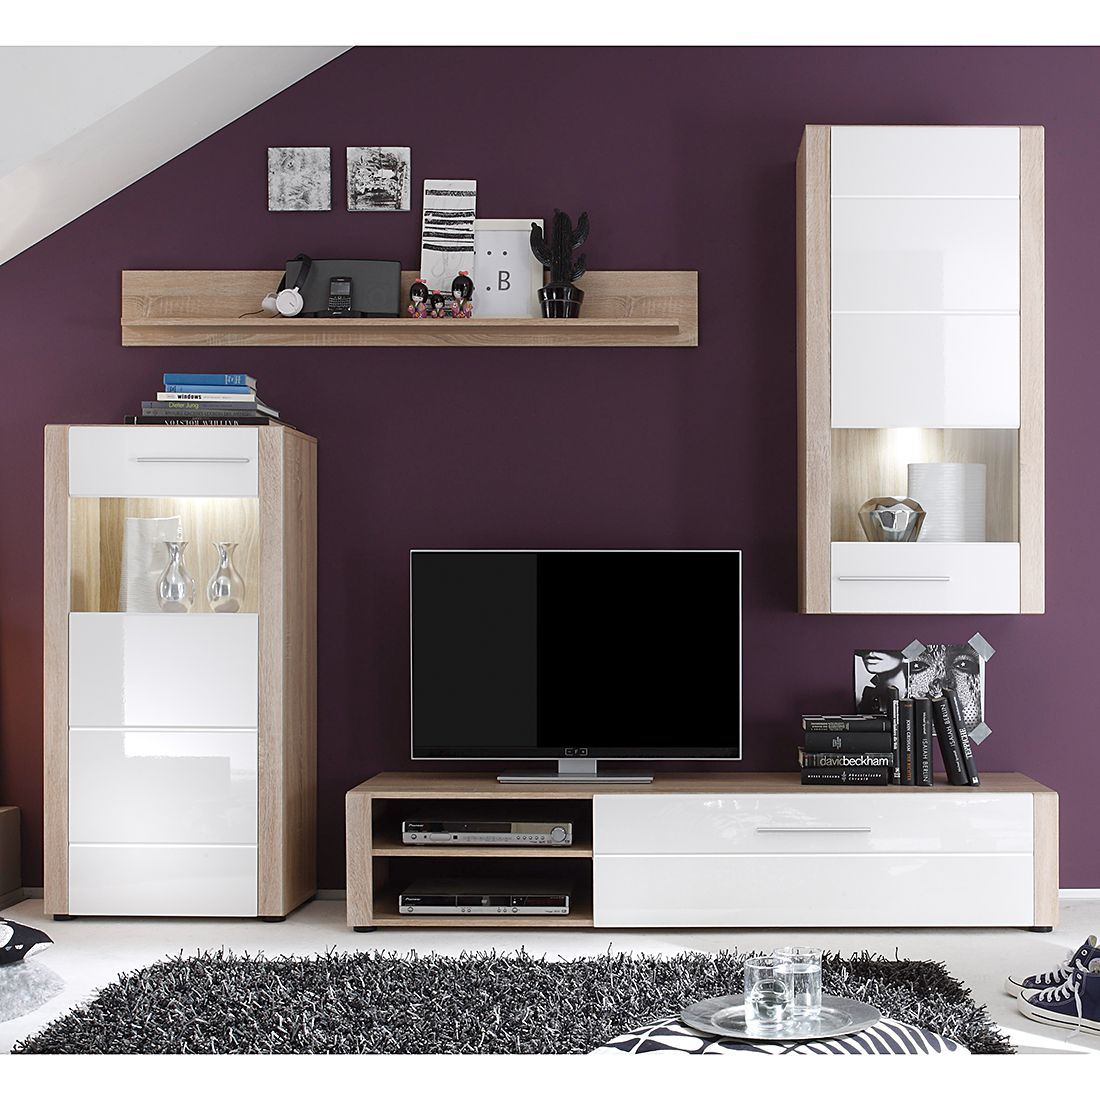 wohnwand minel ii 4 teilig inkl beleuchtung eiche s gerau dekor wei hochglanz. Black Bedroom Furniture Sets. Home Design Ideas